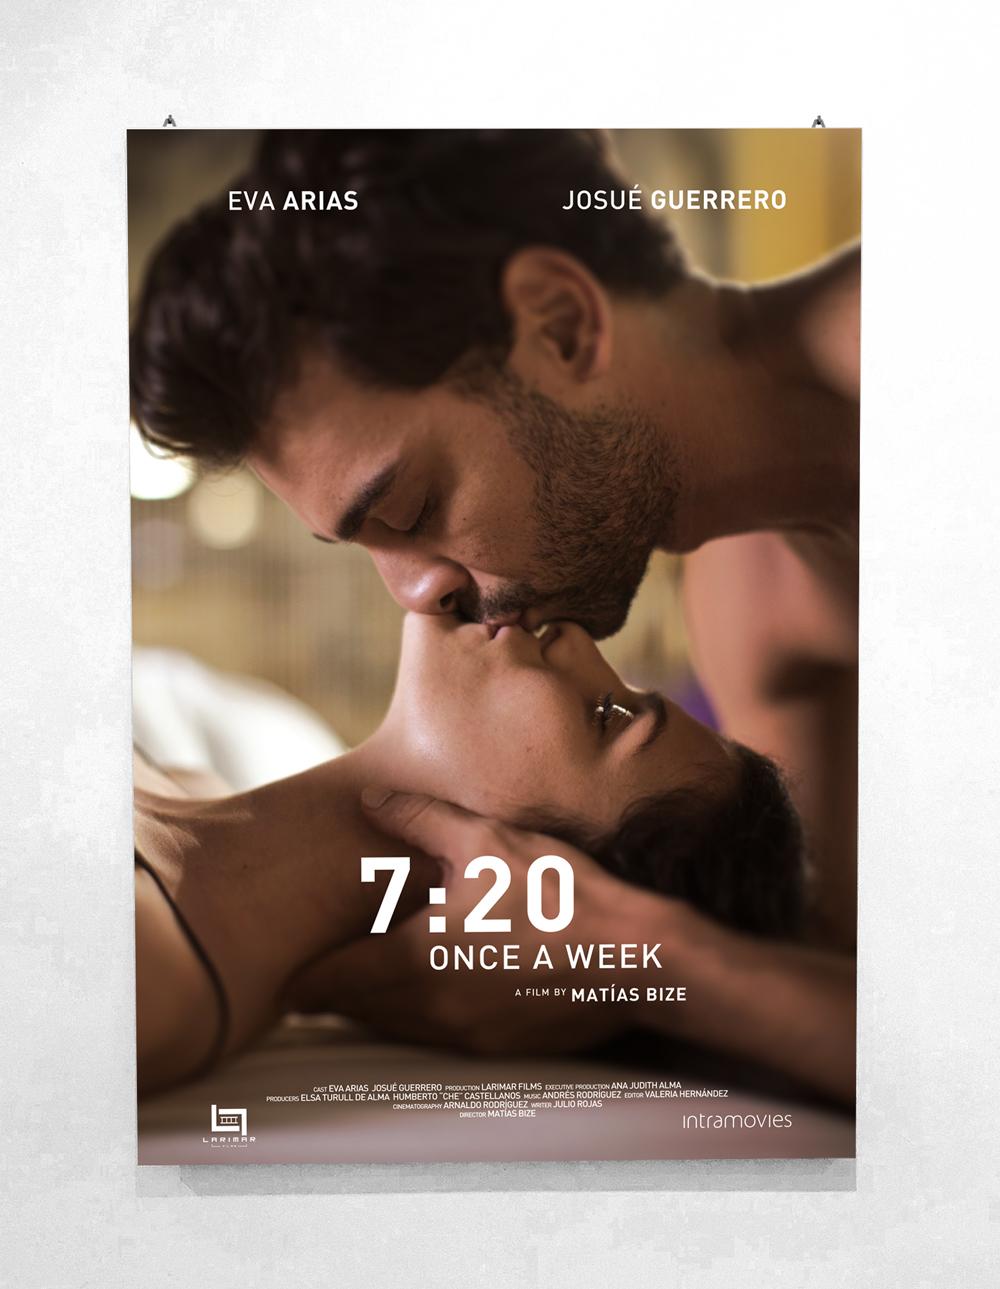 7:20 Once a week film di Matias Bize